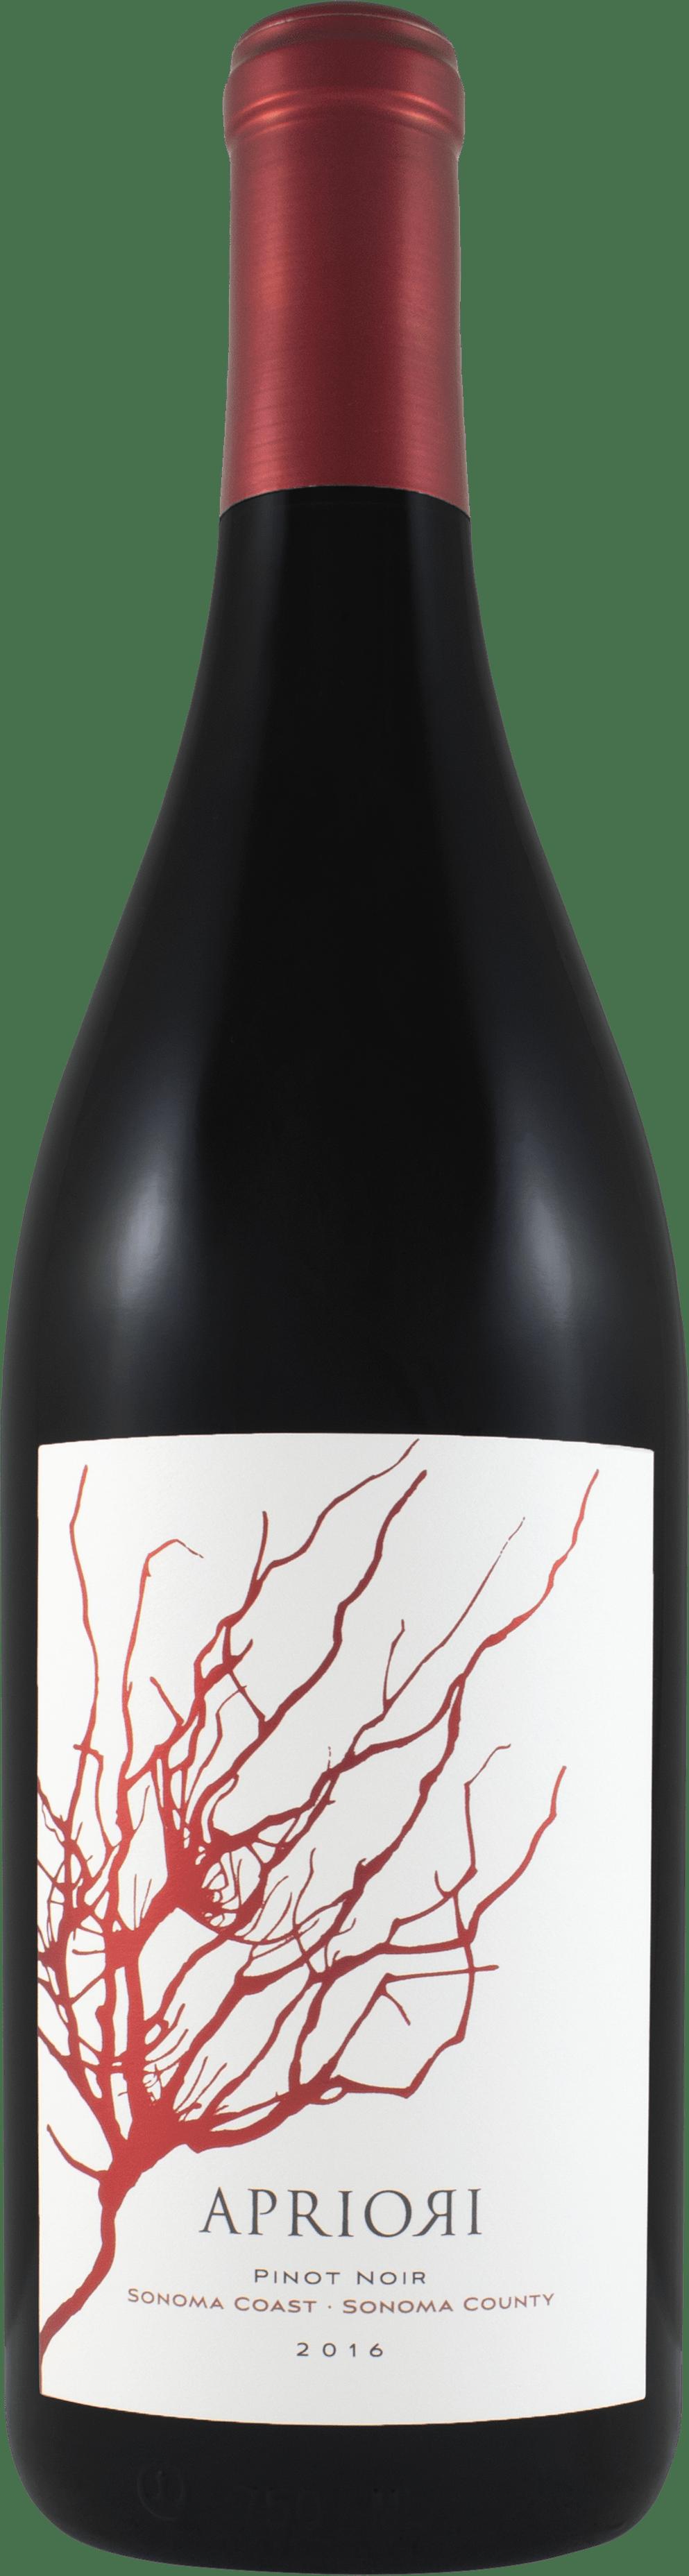 2016 Apriori Pinot Noir Sonoma Coast